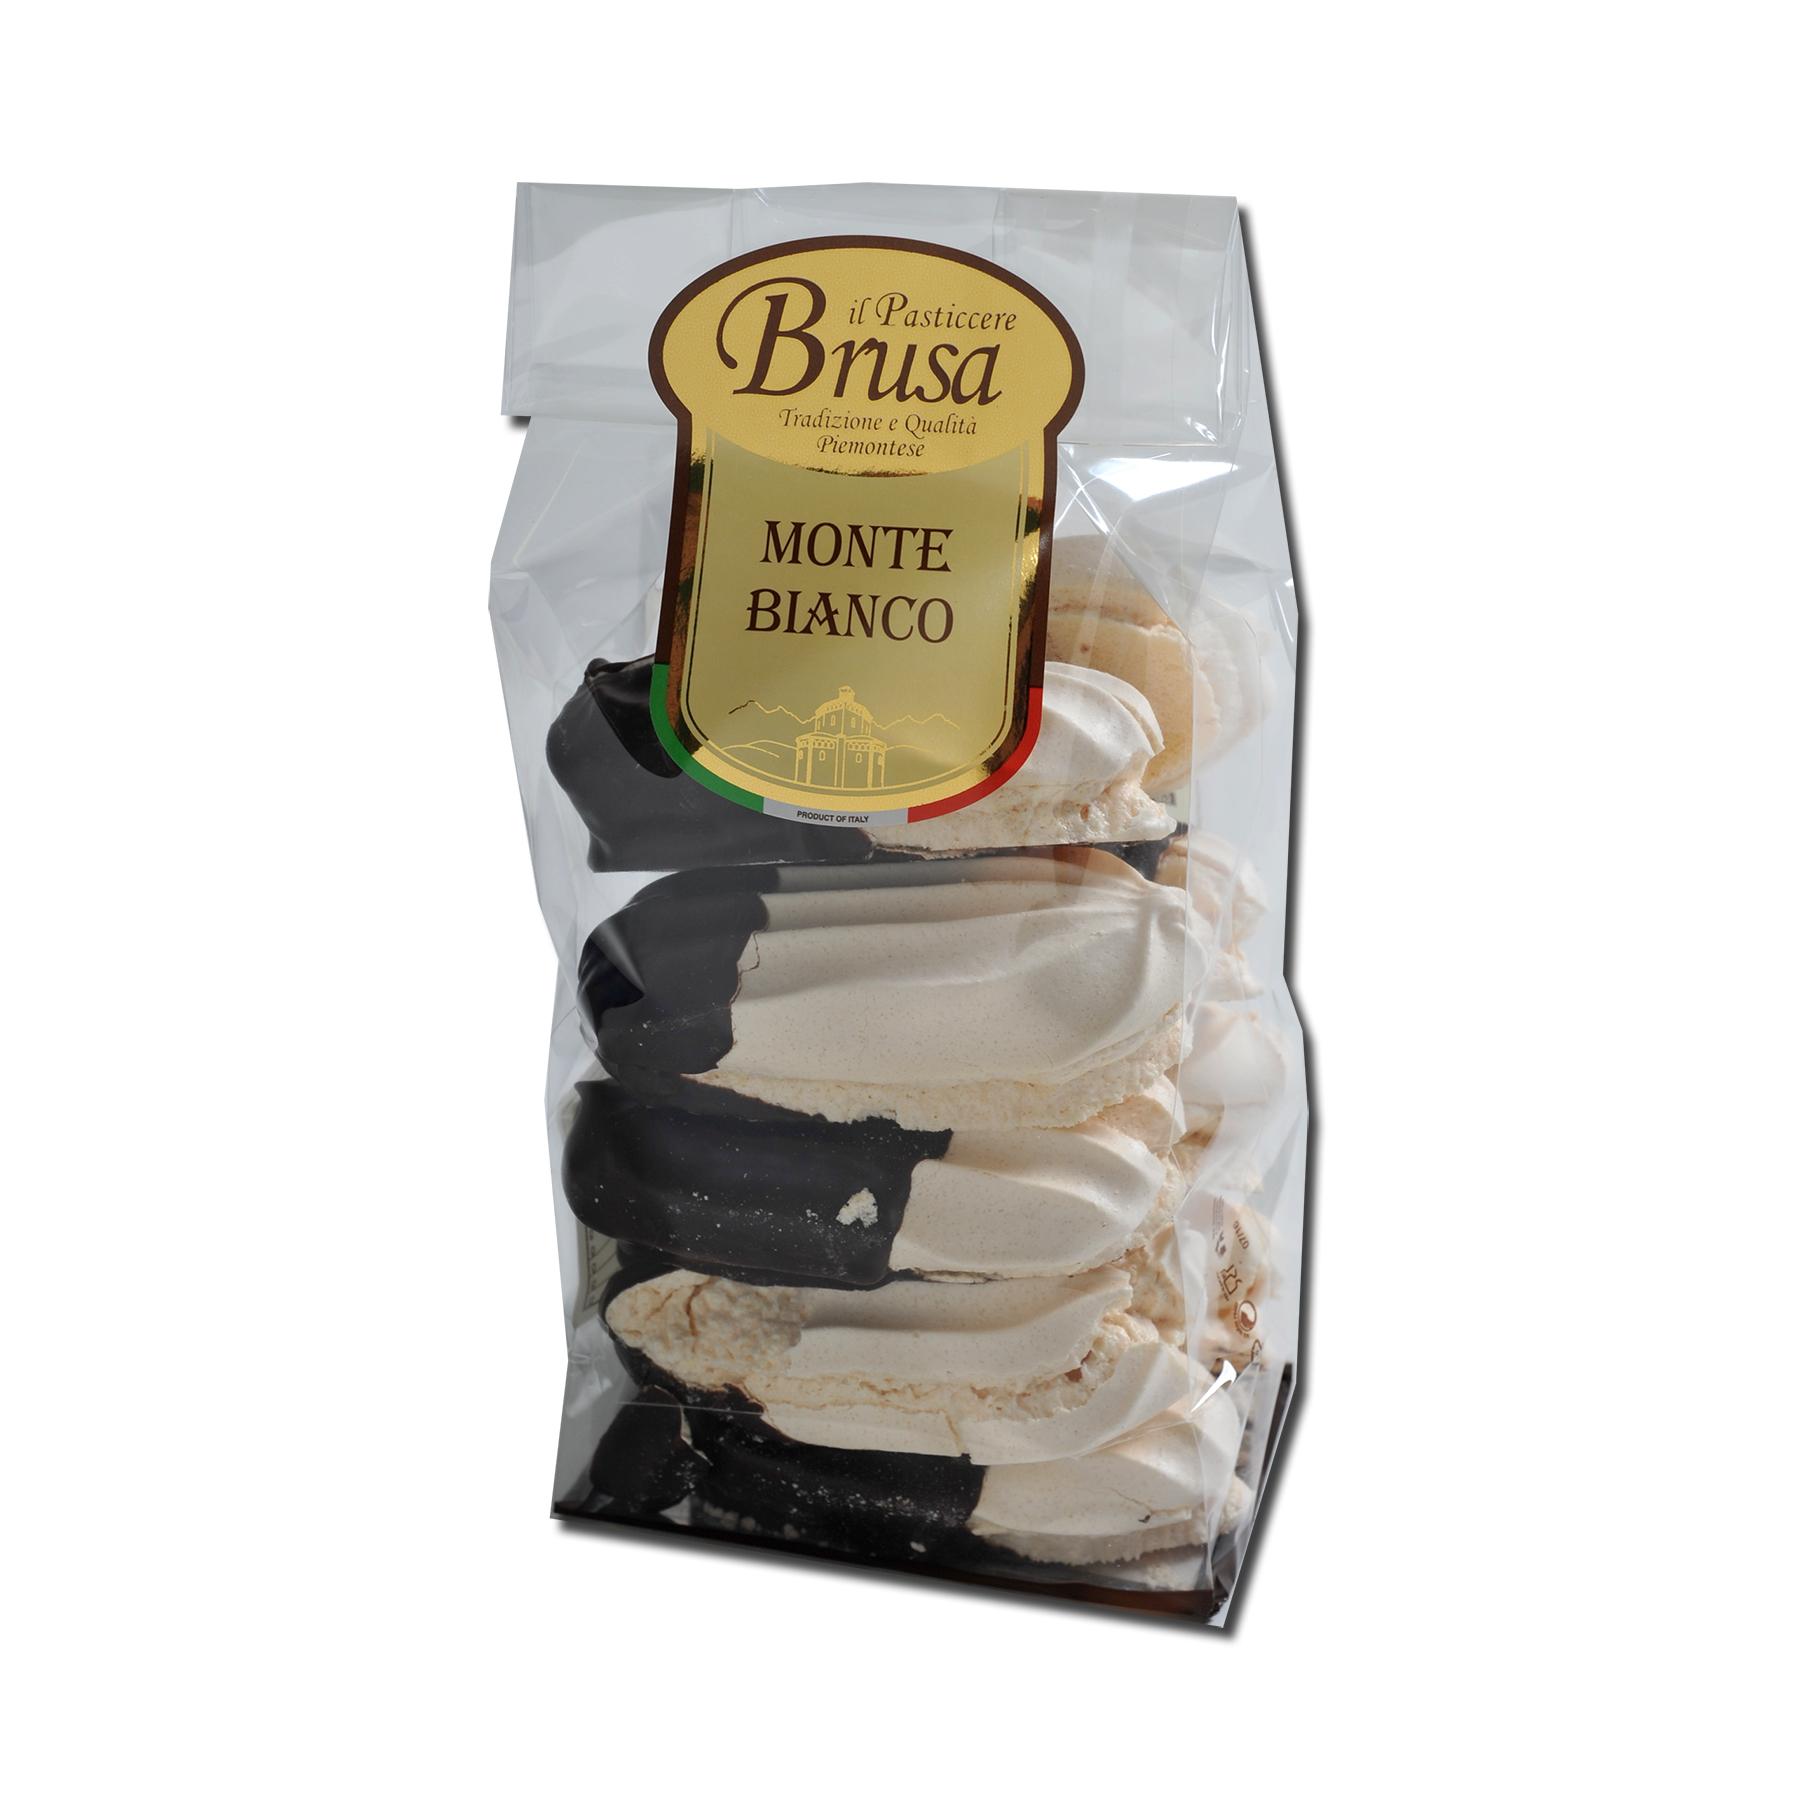 monte-bianco勃朗峰酥饼-200g